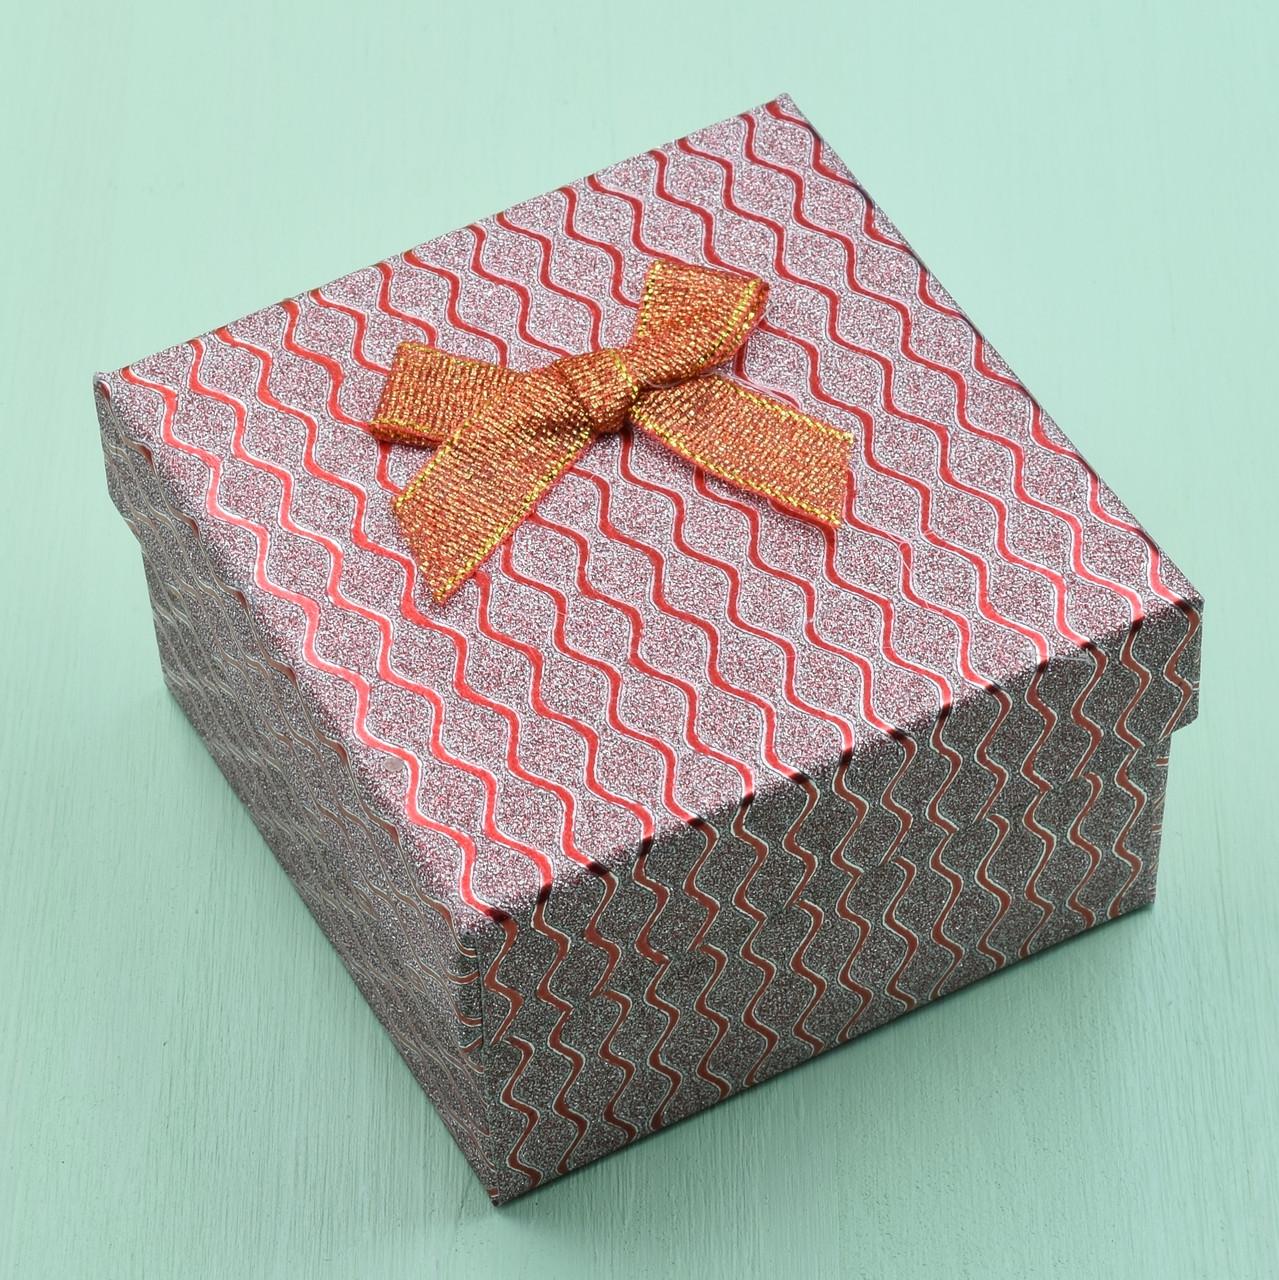 Коробочка красная для кольца серег 741185 размер 9х9 см